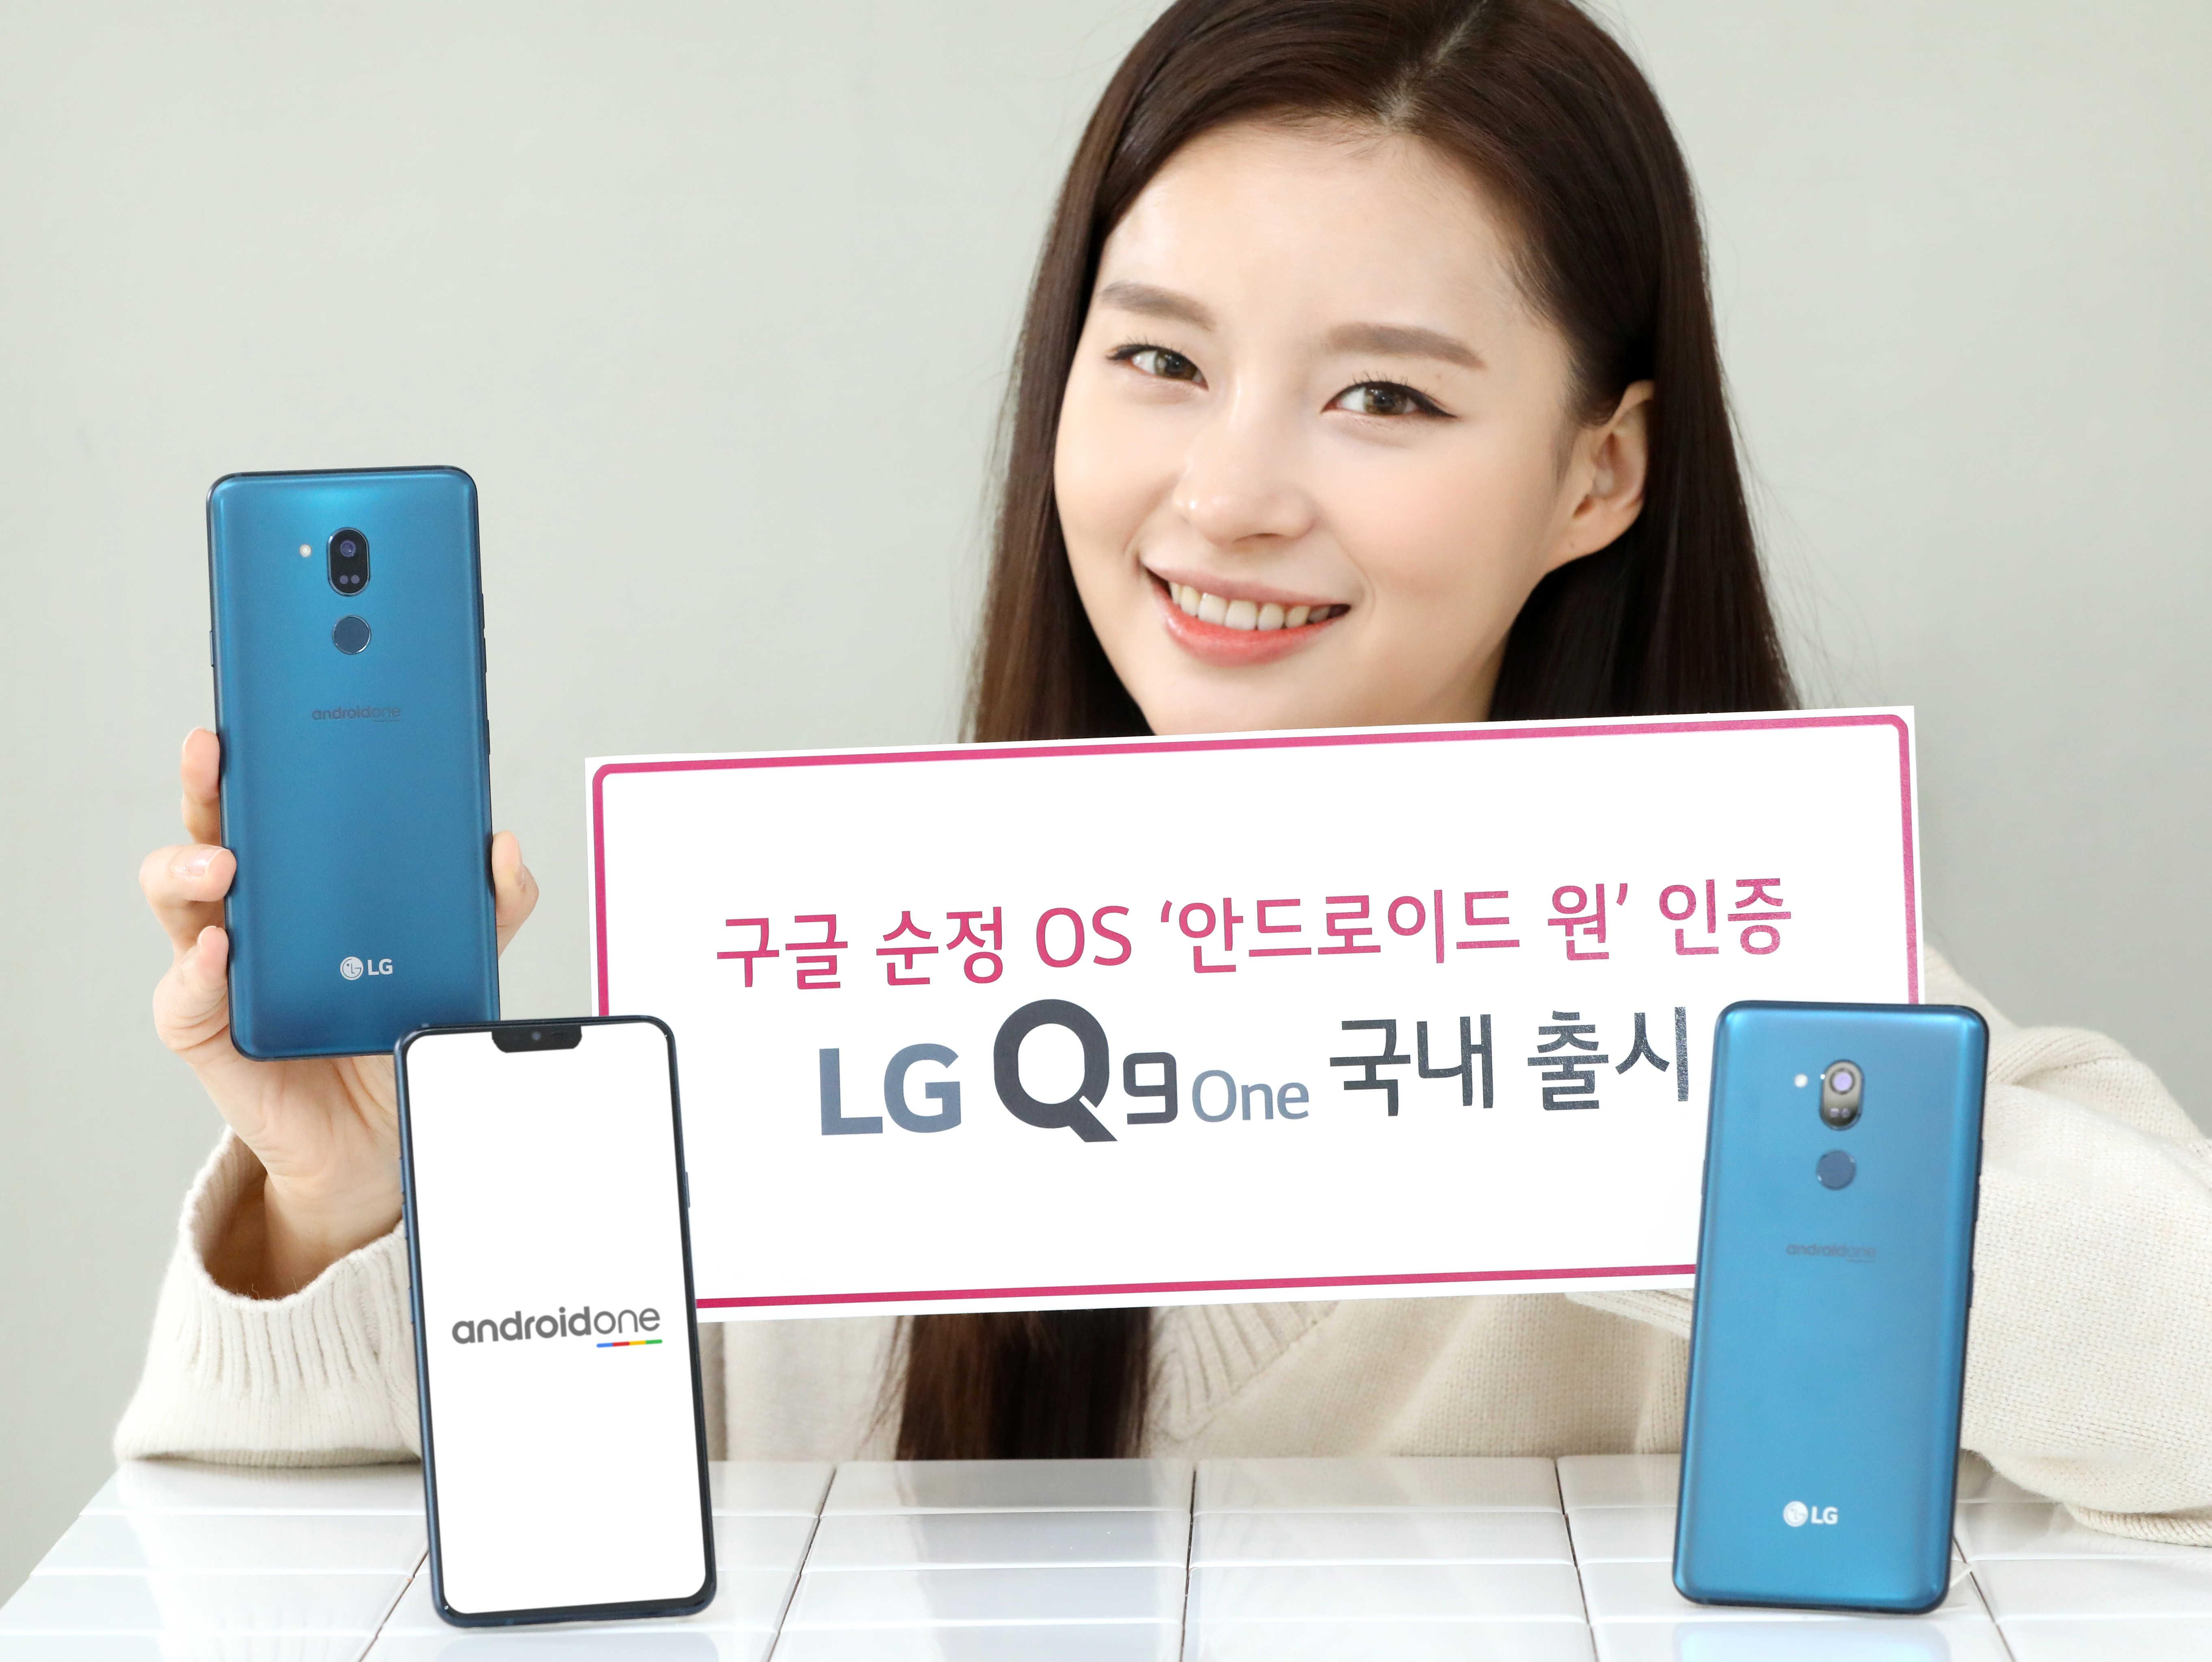 LG전자가 15일 실속형 스마트폰 'LG Q9 one'을 출시한다. LG전자 모델이 LG Q9 one을 소개하고 있다.